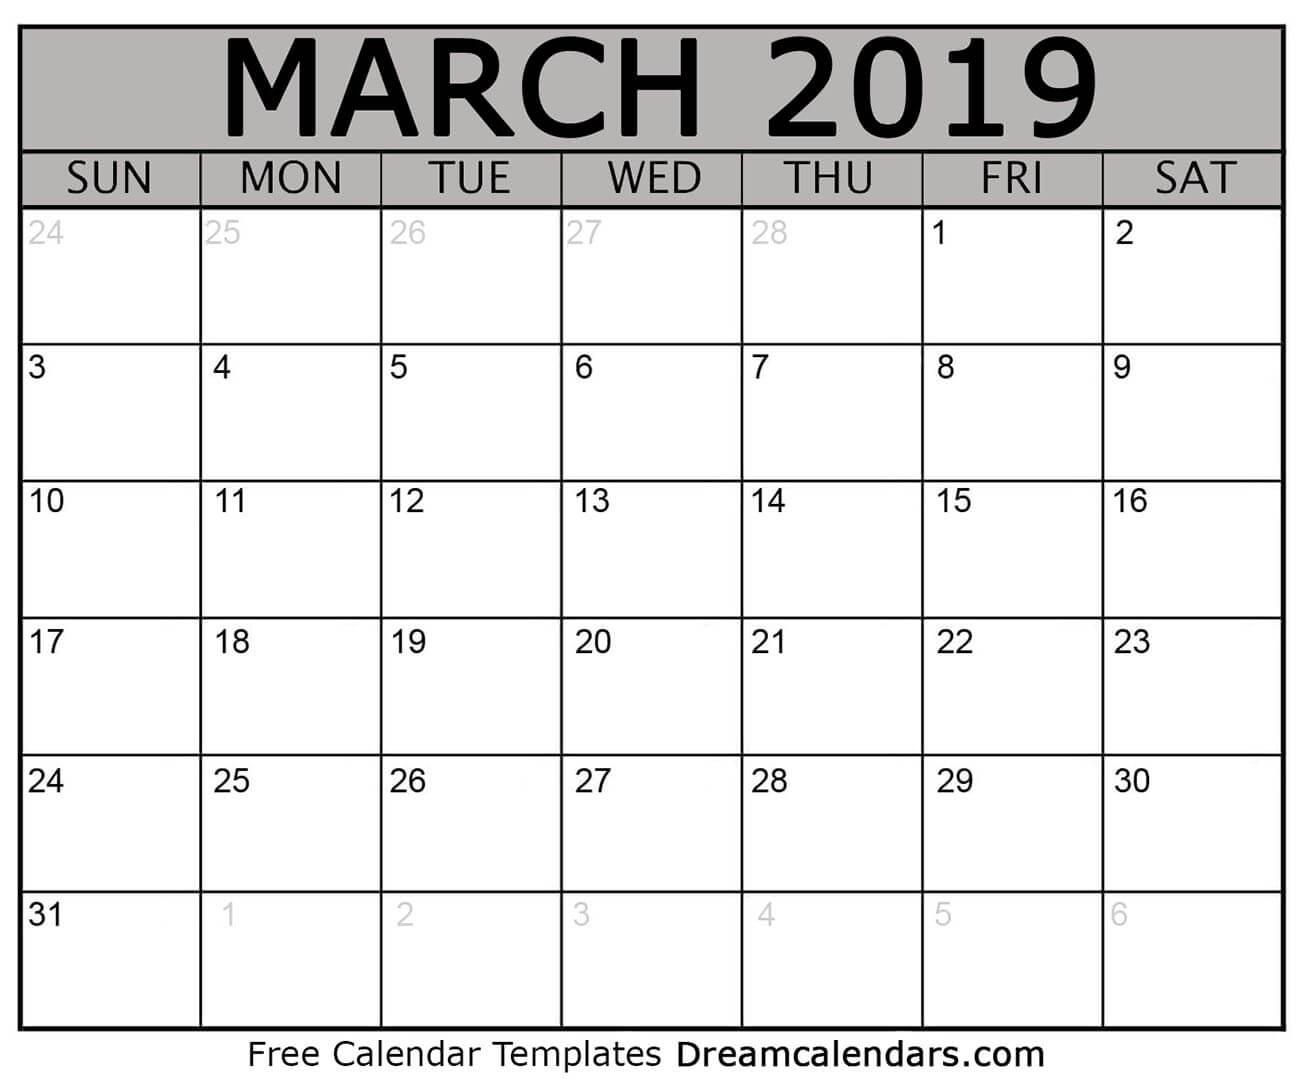 Free March 2019 Printable Calendar | Dream Calendars